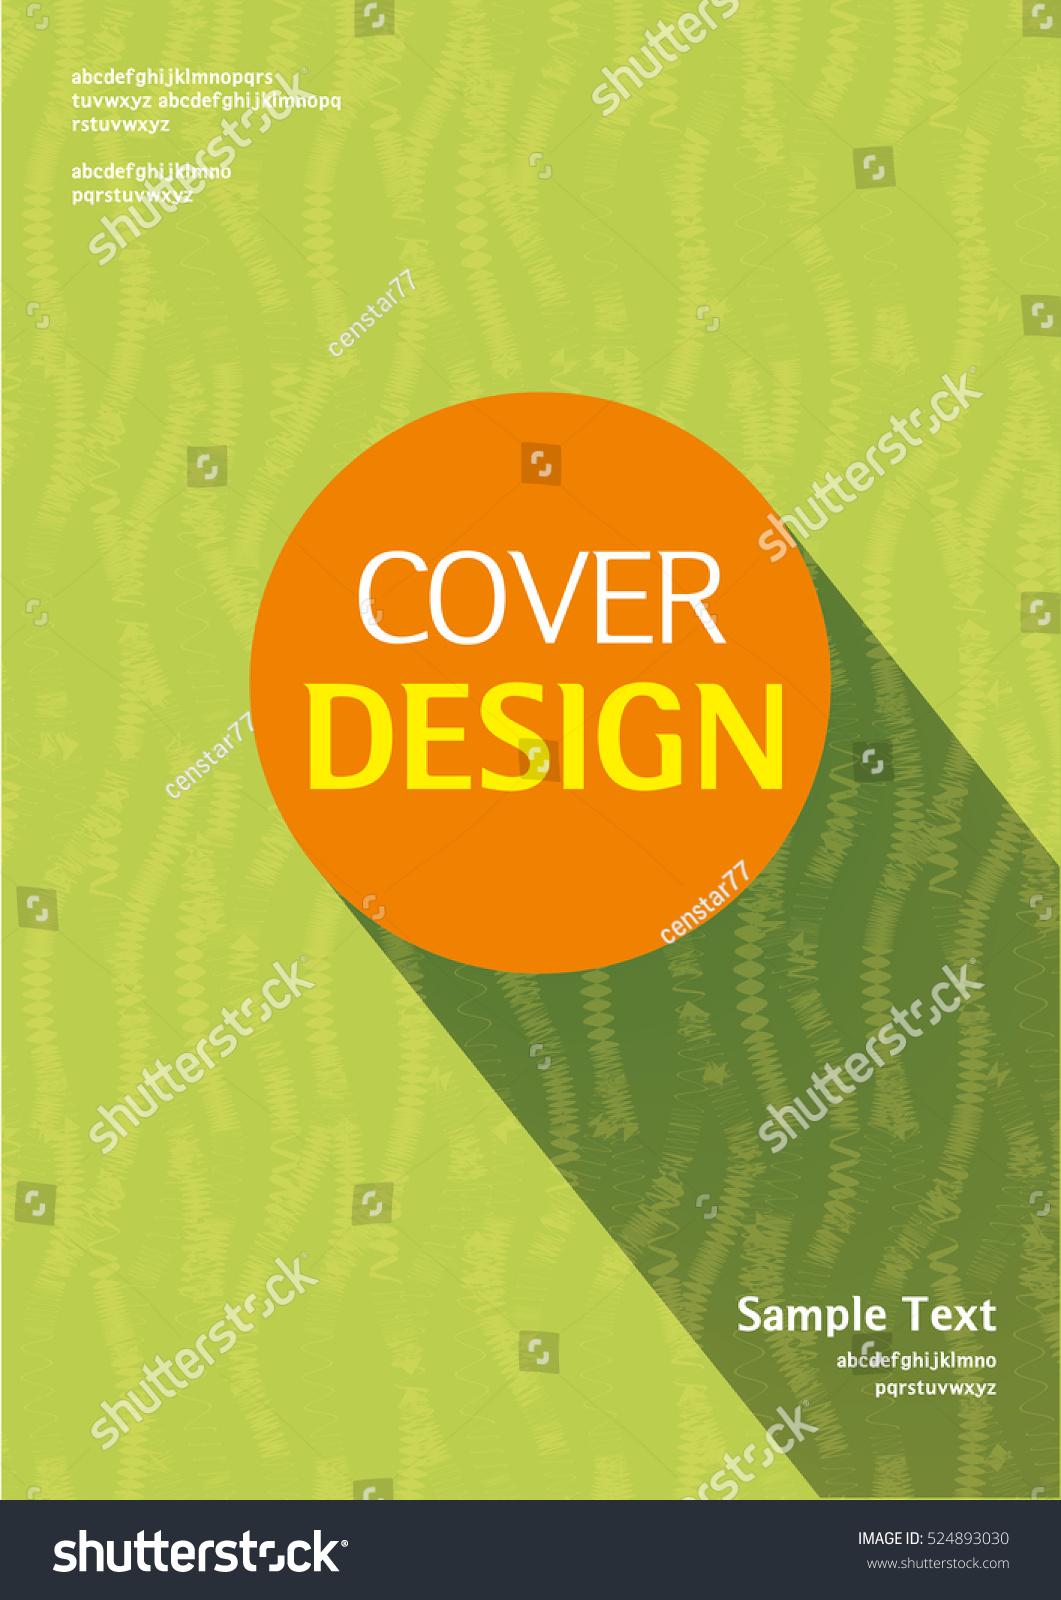 Book Cover Vector Graphic : Book cover design stock vector shutterstock